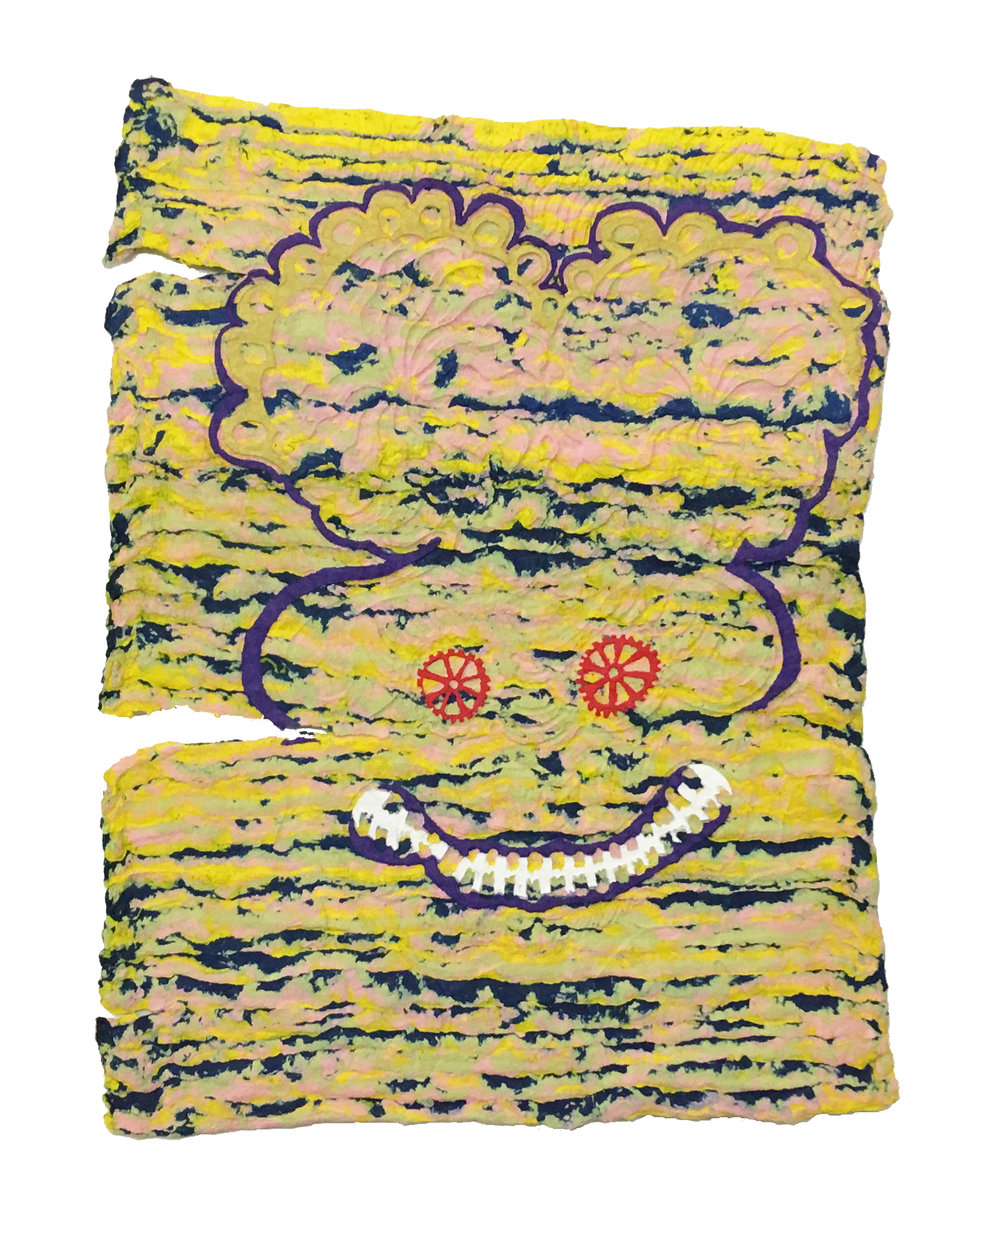 Daniel Wiener   Cannot Sing a Single Note , 2017  Paper pulp